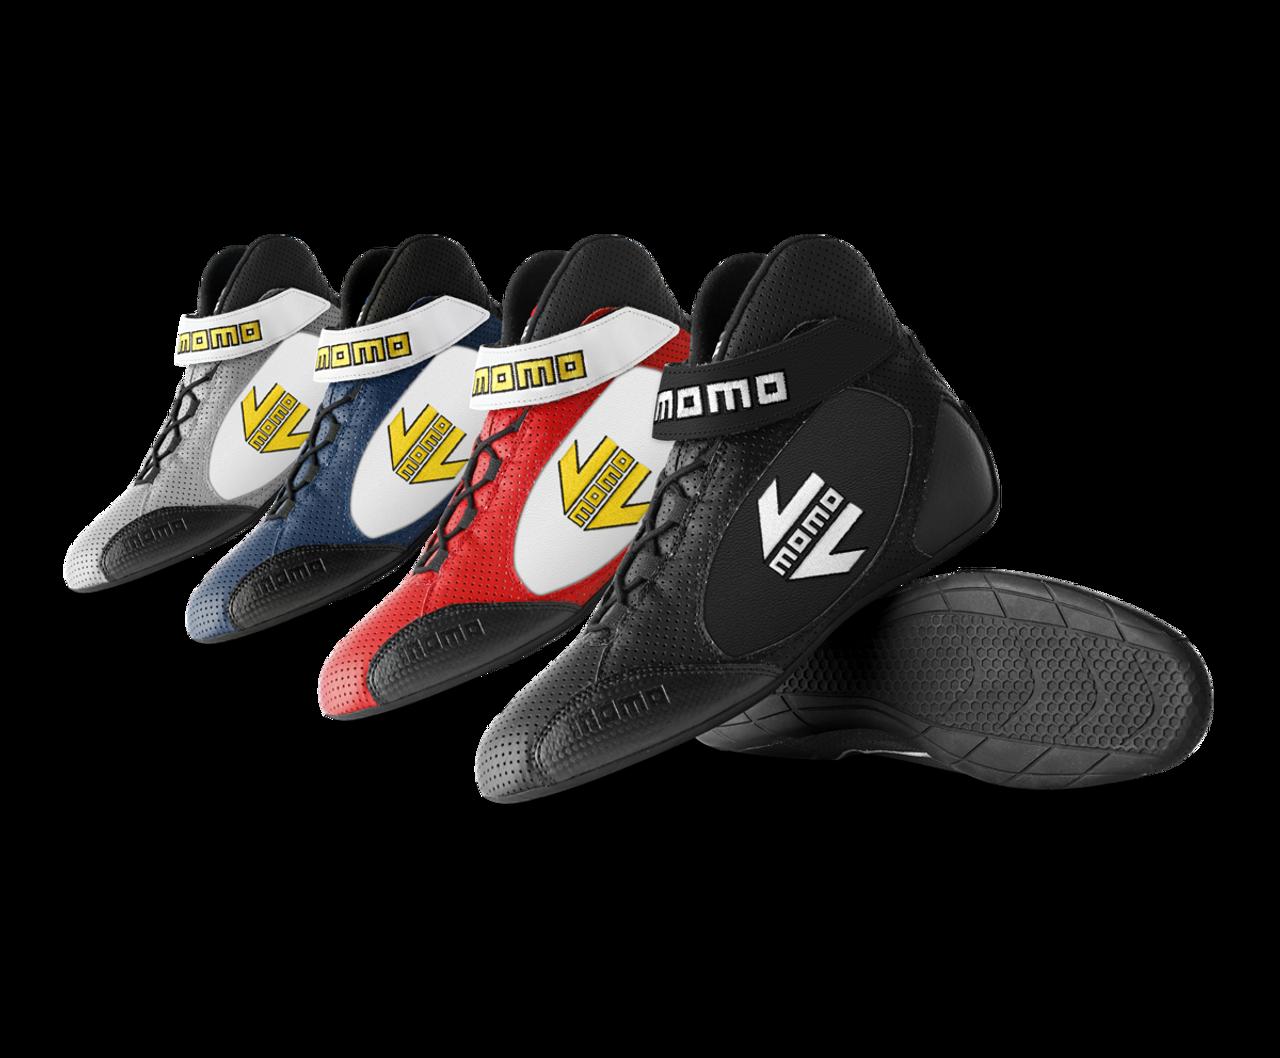 MOMO GT PRO Racing Shoes